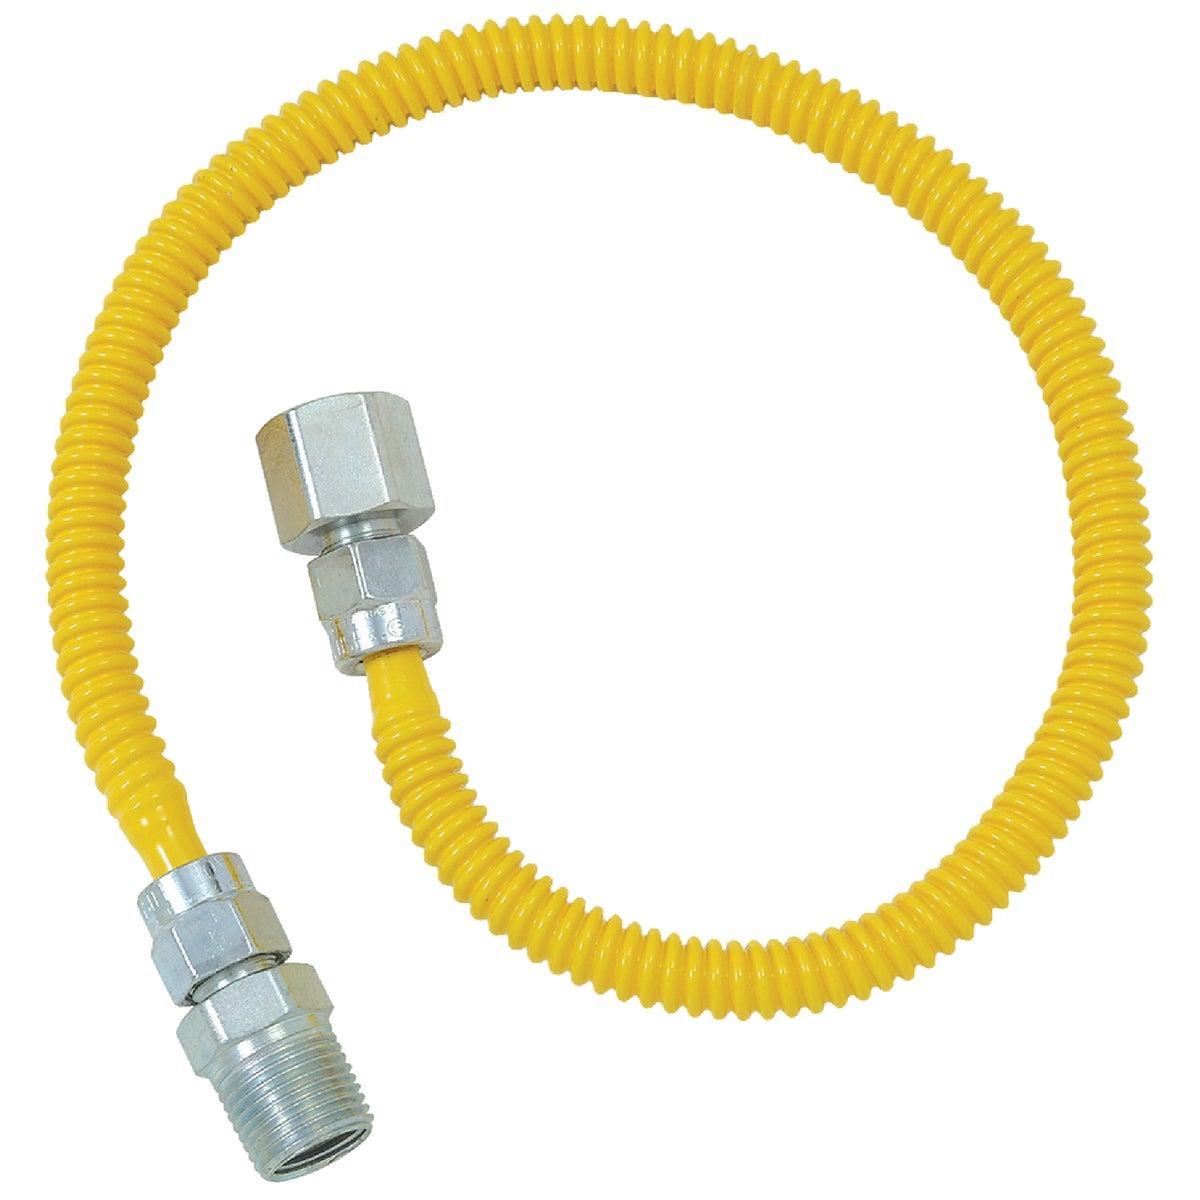 3/8X48 GAS CONNECTOR